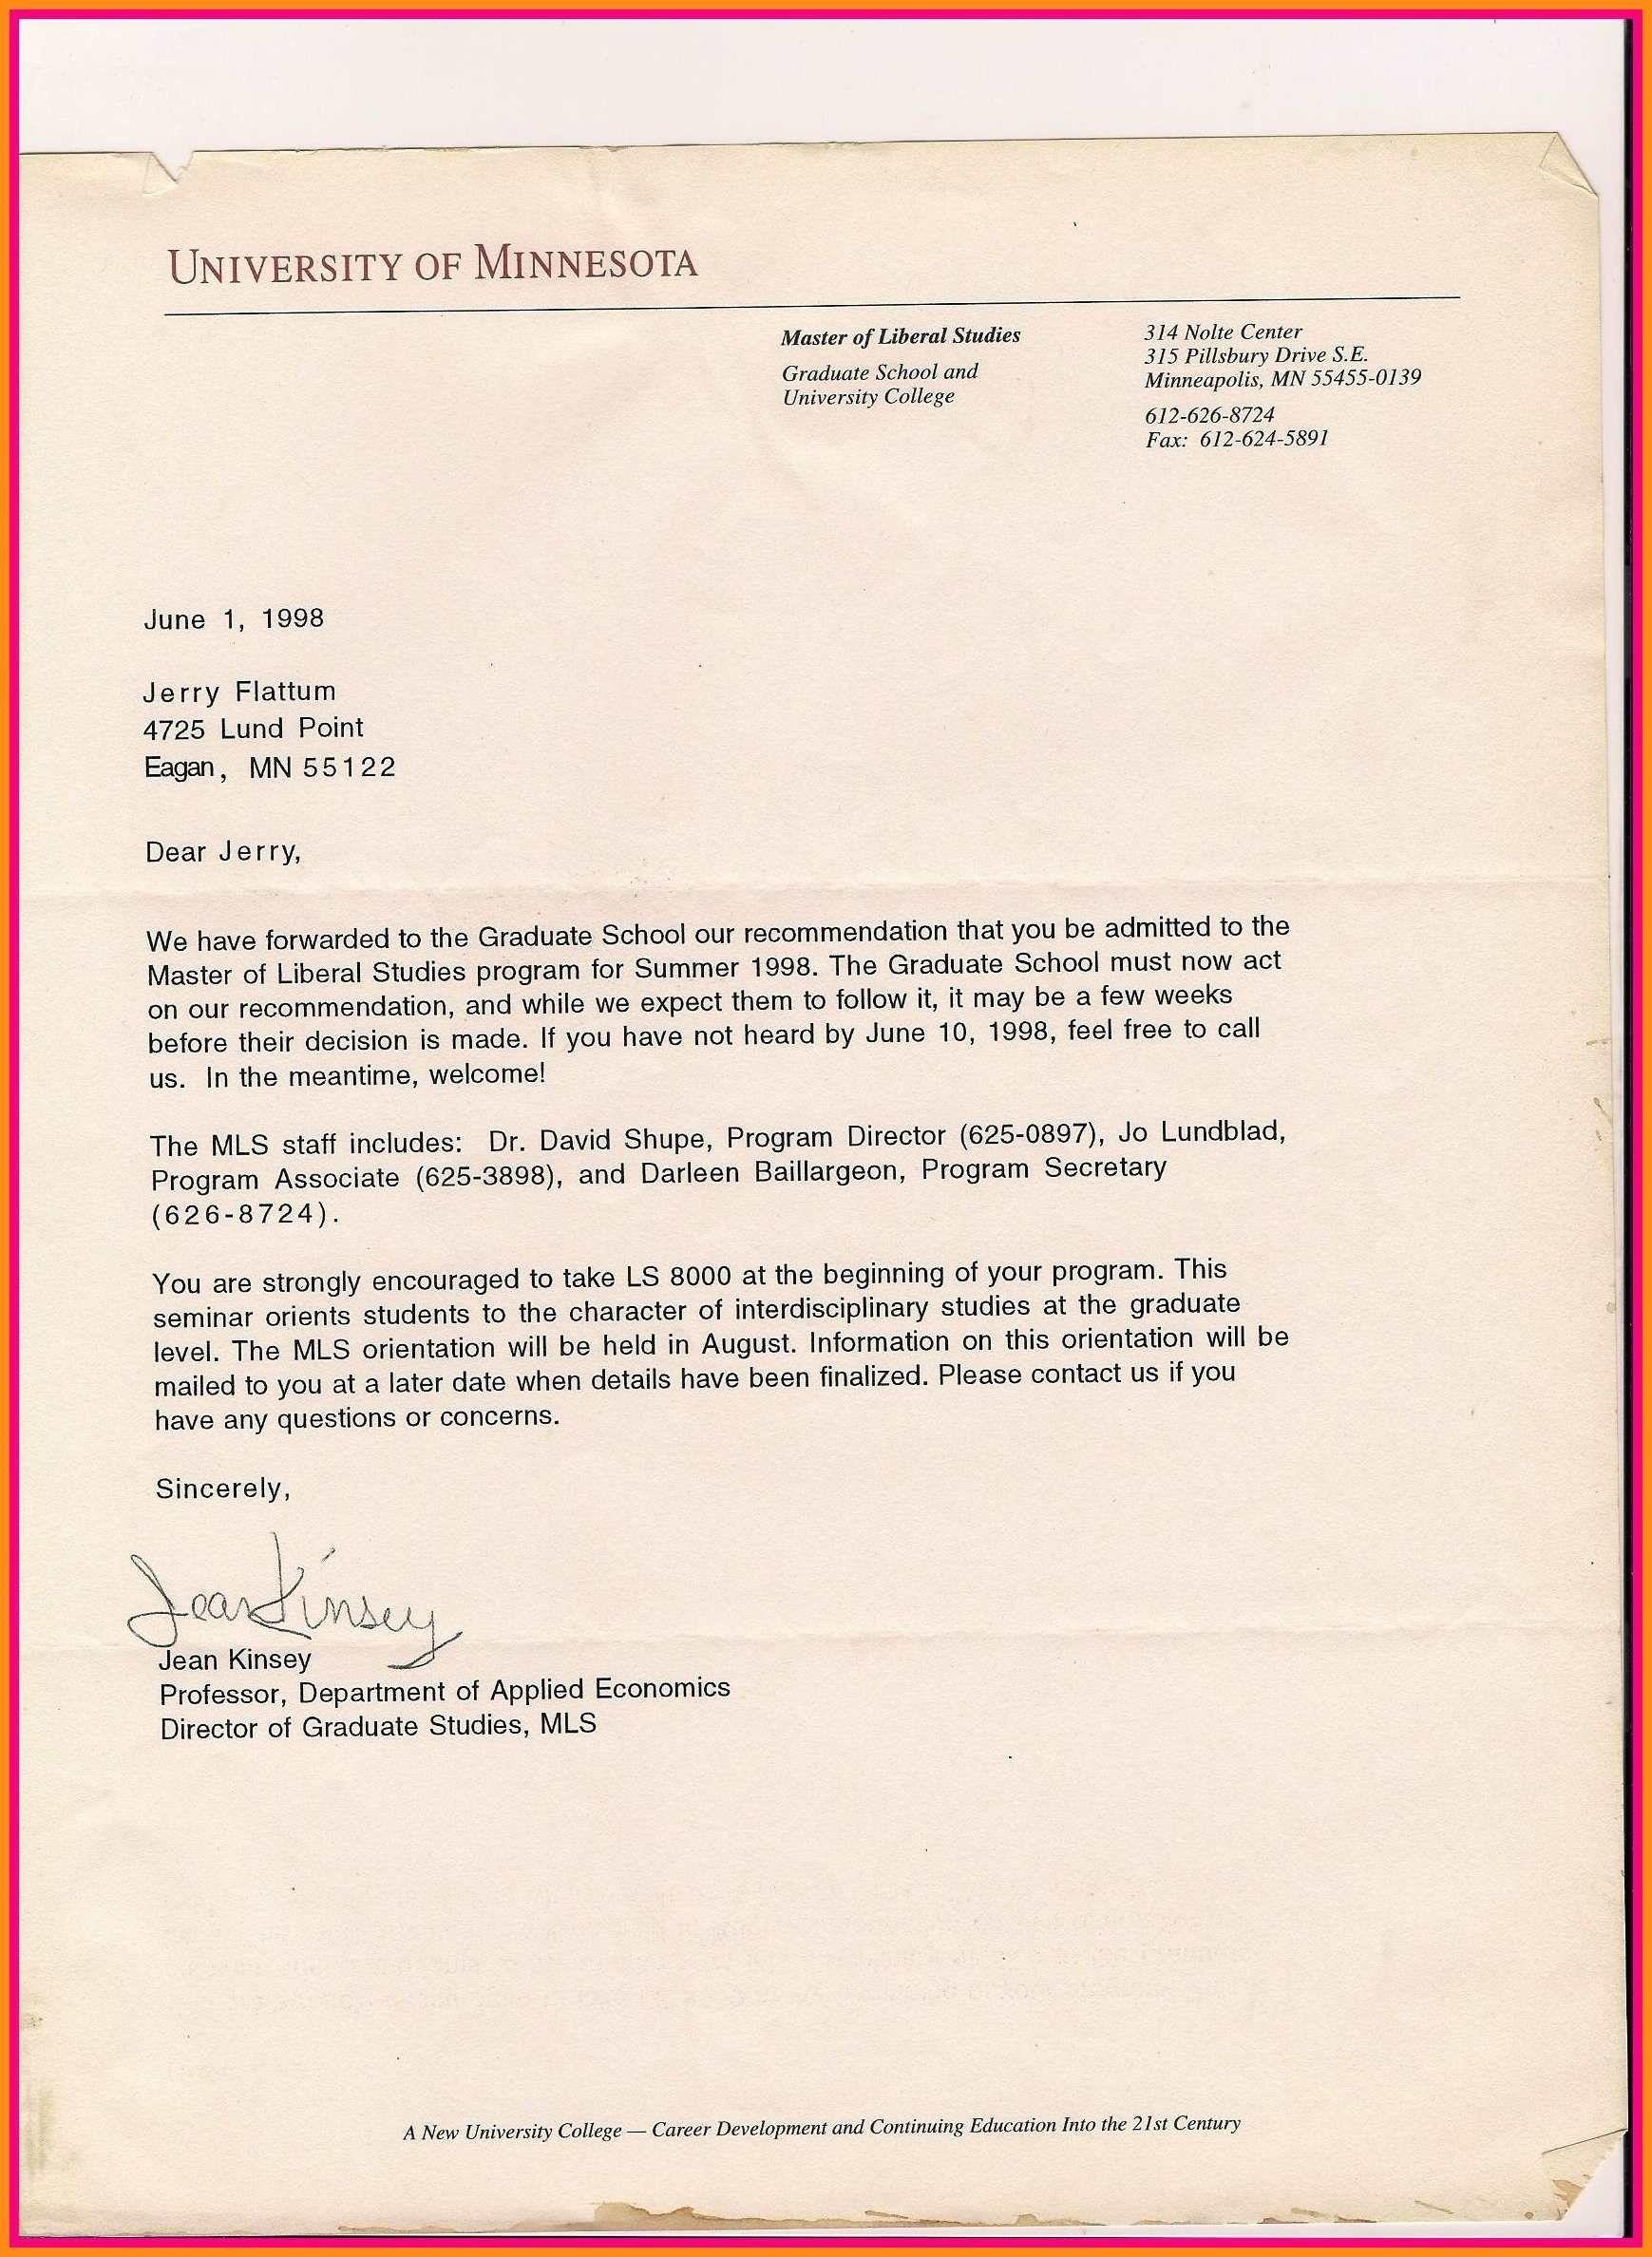 Csuf career center resume best of msw letter re mendation